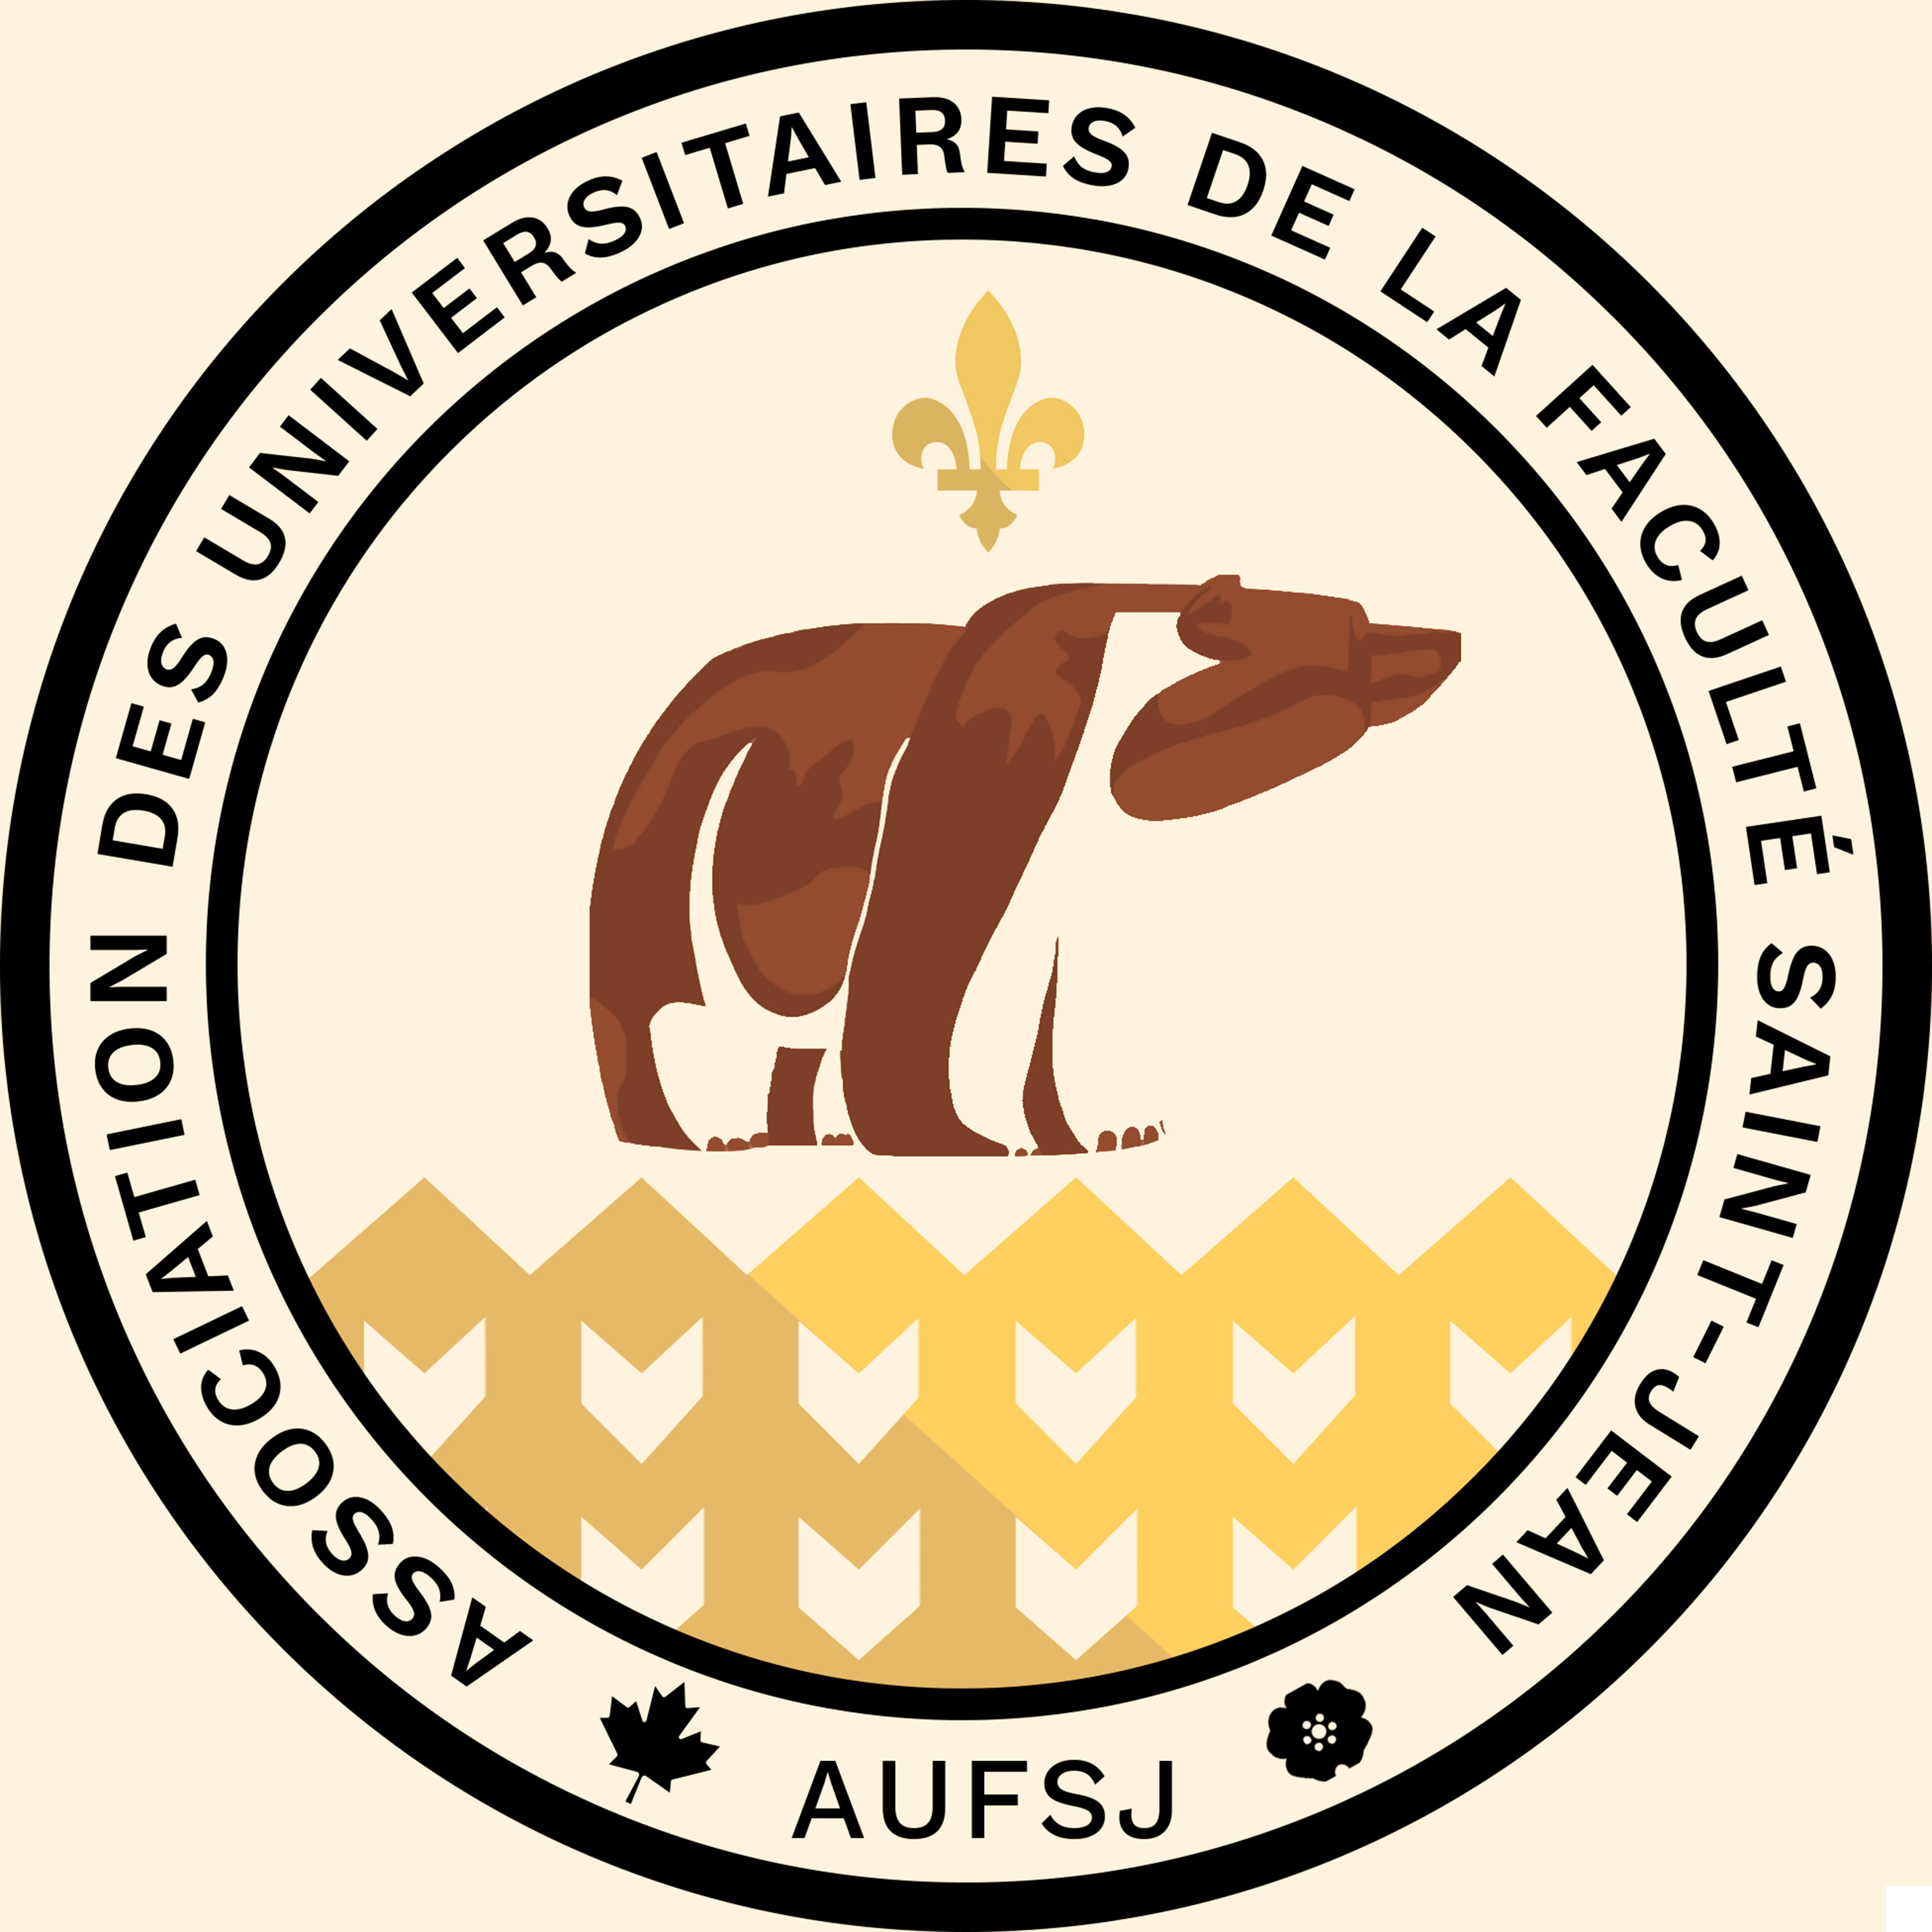 Logo of the AUFSJ